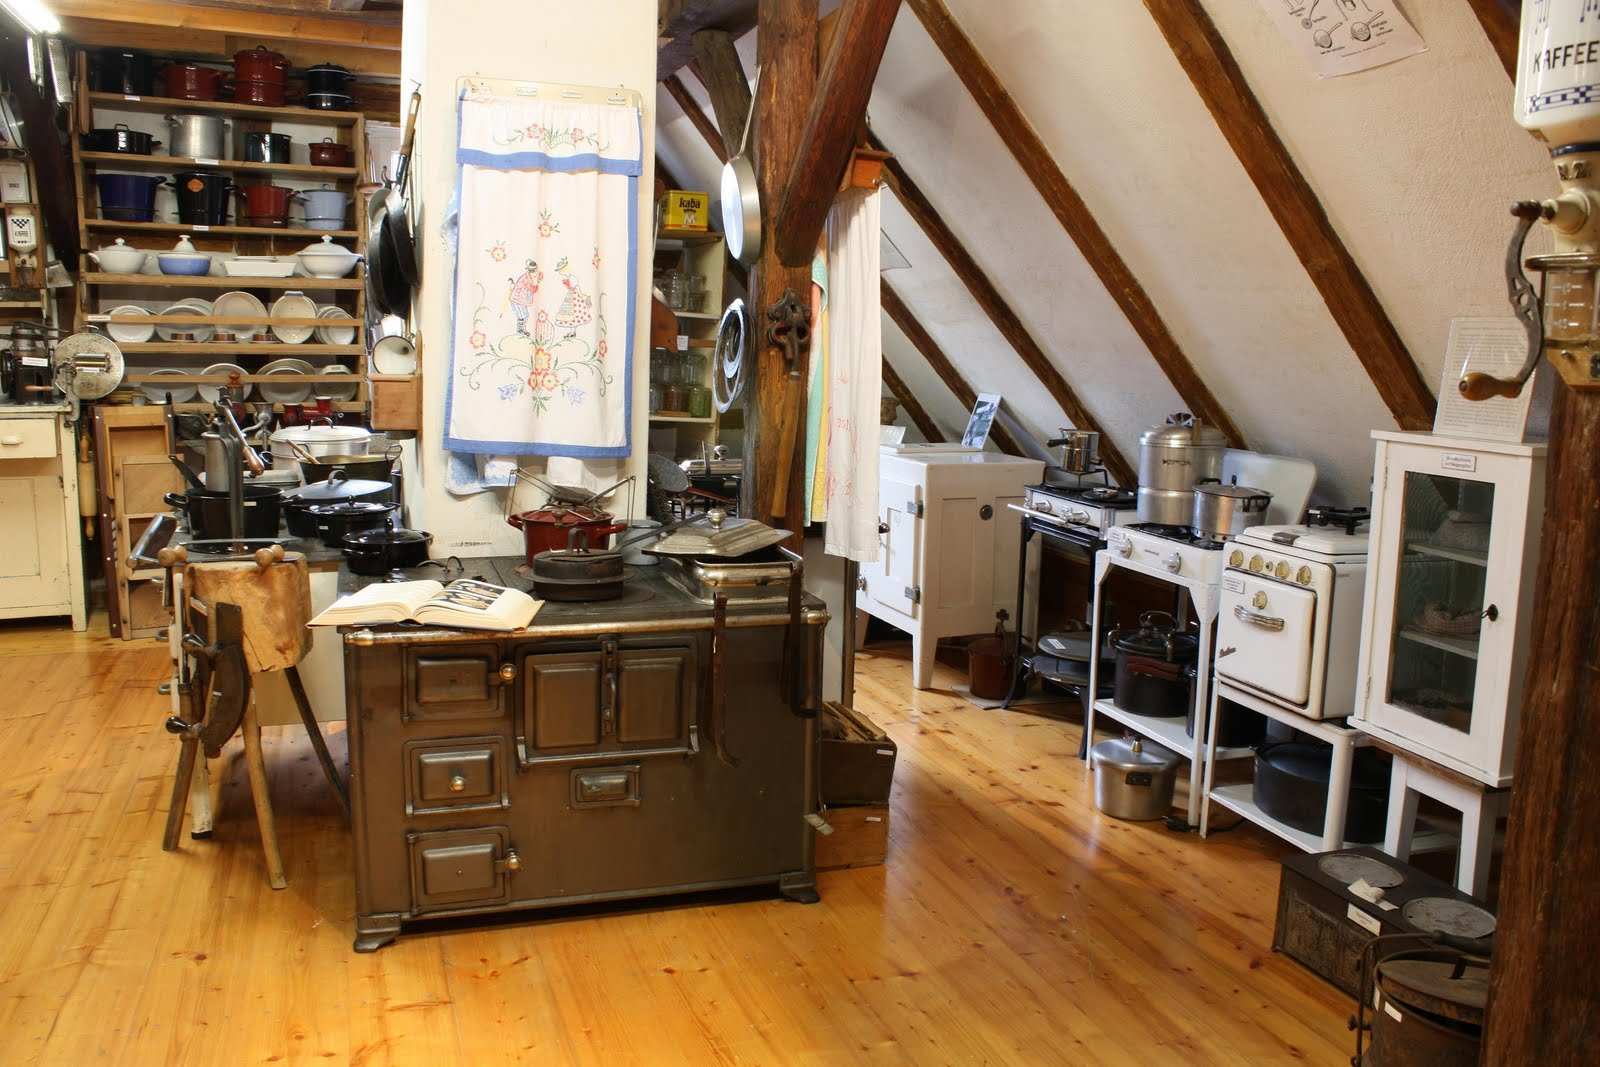 eningen u a rundgang durch das heimatmuseum eningen. Black Bedroom Furniture Sets. Home Design Ideas